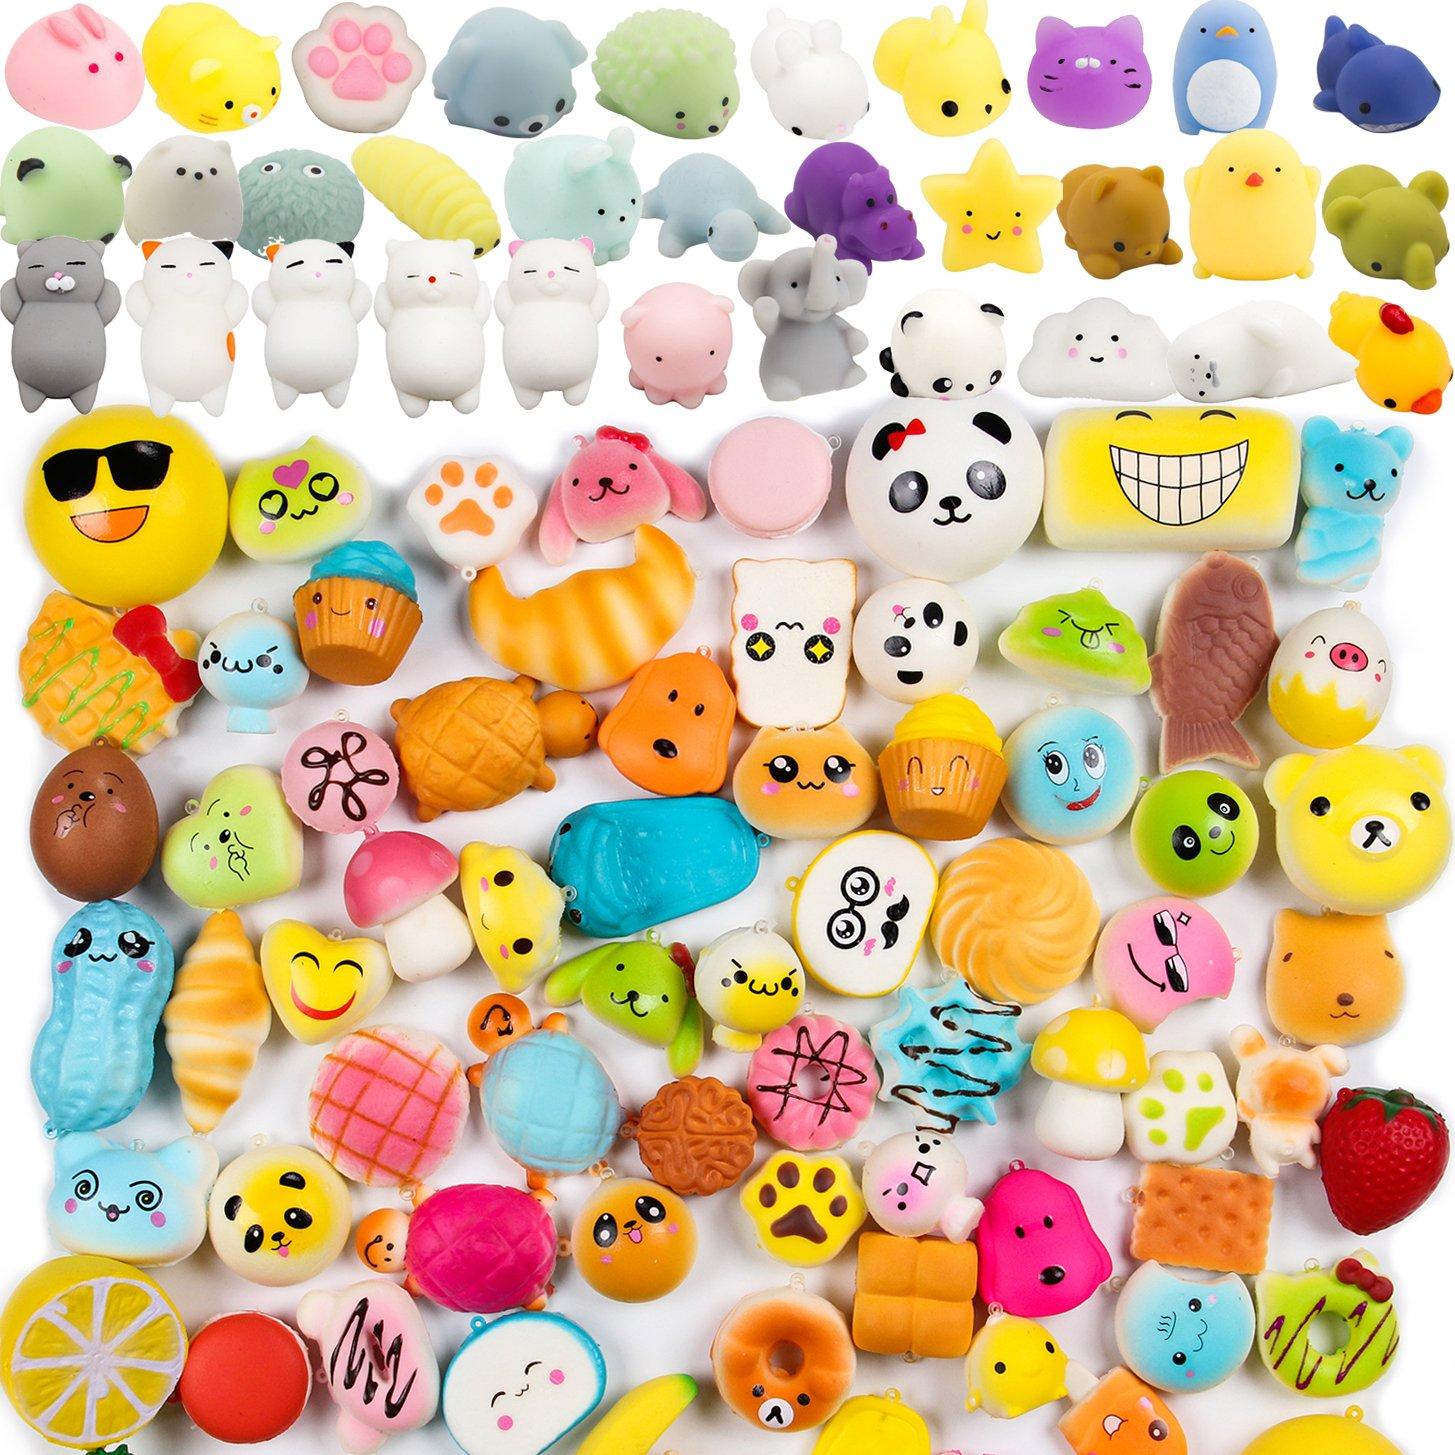 WATINC 60pcs Squishy Toys, Including 30 Pcs Random Cream Scented Slow Rising Kawaii Simulation Squishy Toy Medium Mini Soft Squishies & Random 30 Pcs Cute Animal Kawaii Mini Soft Squeeze Toy